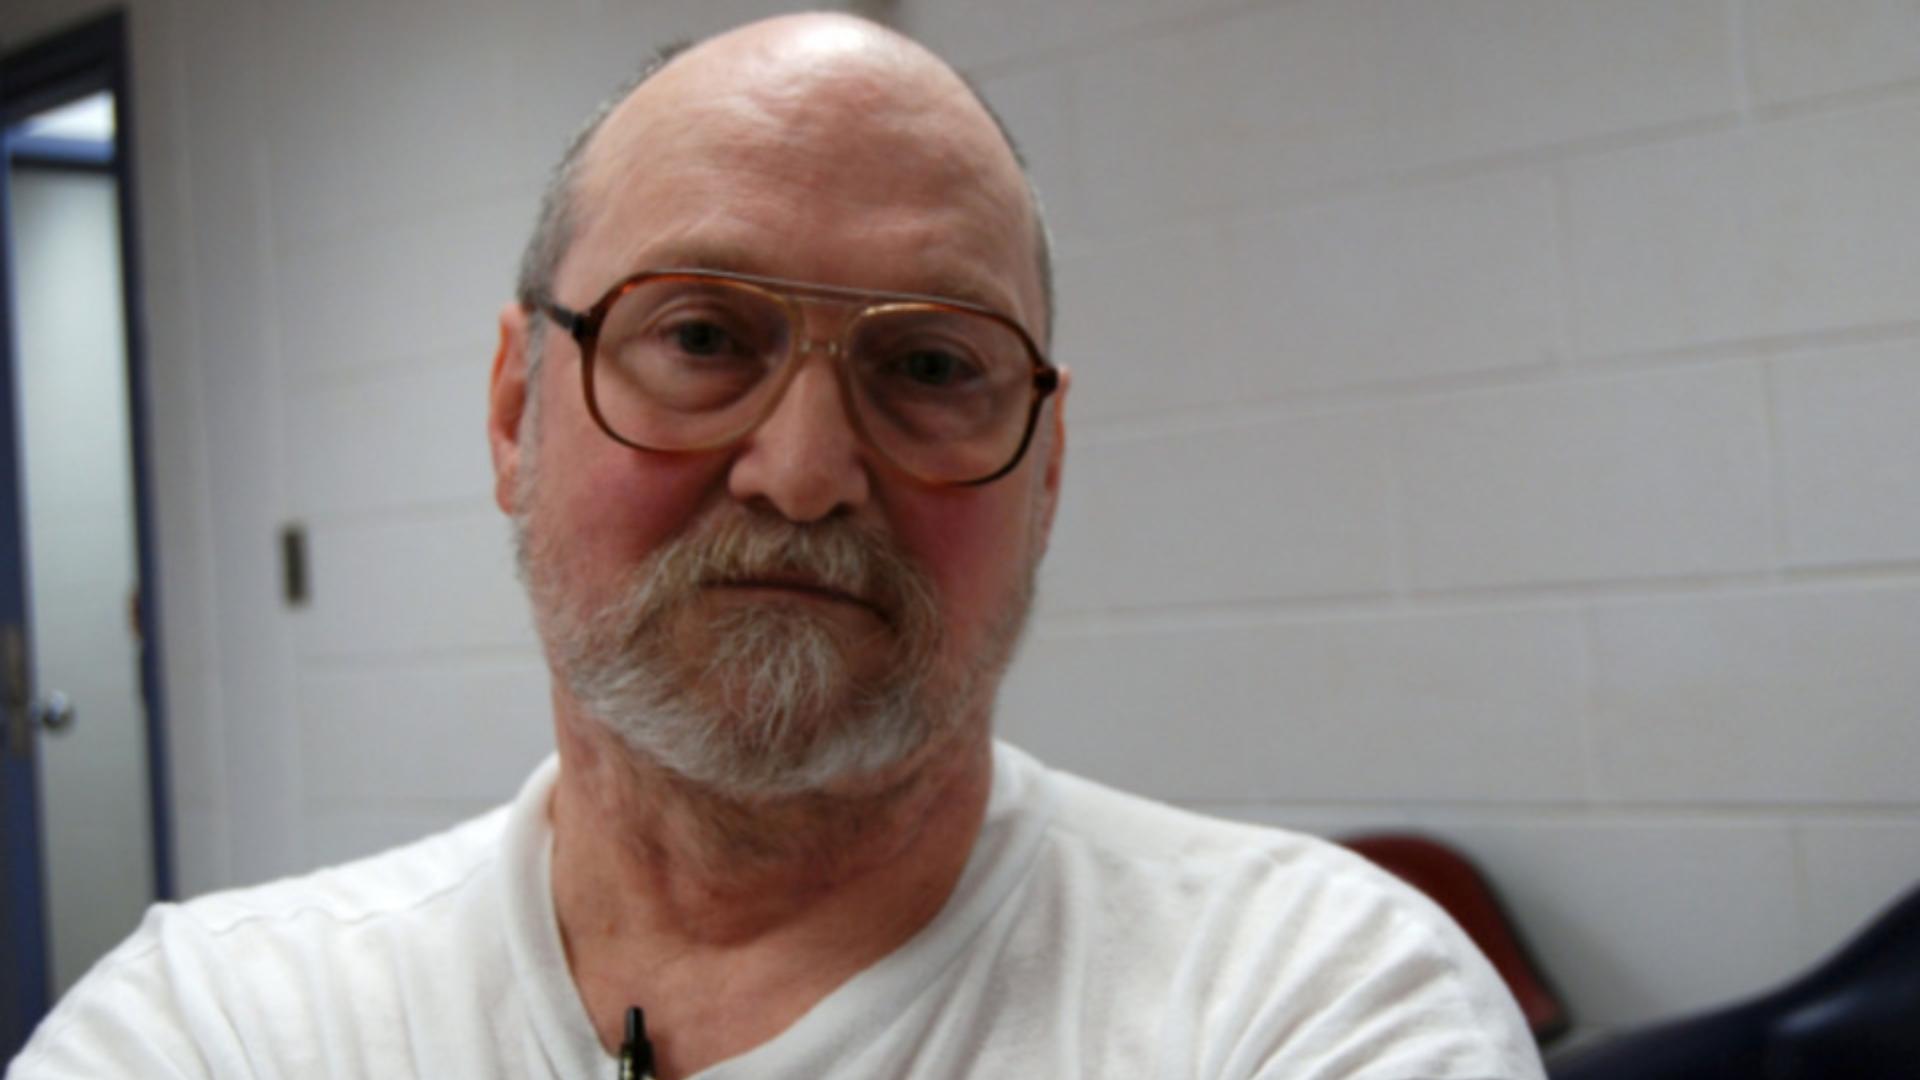 David Earl Miller. (Gentileza: www.nashvillescene.com)